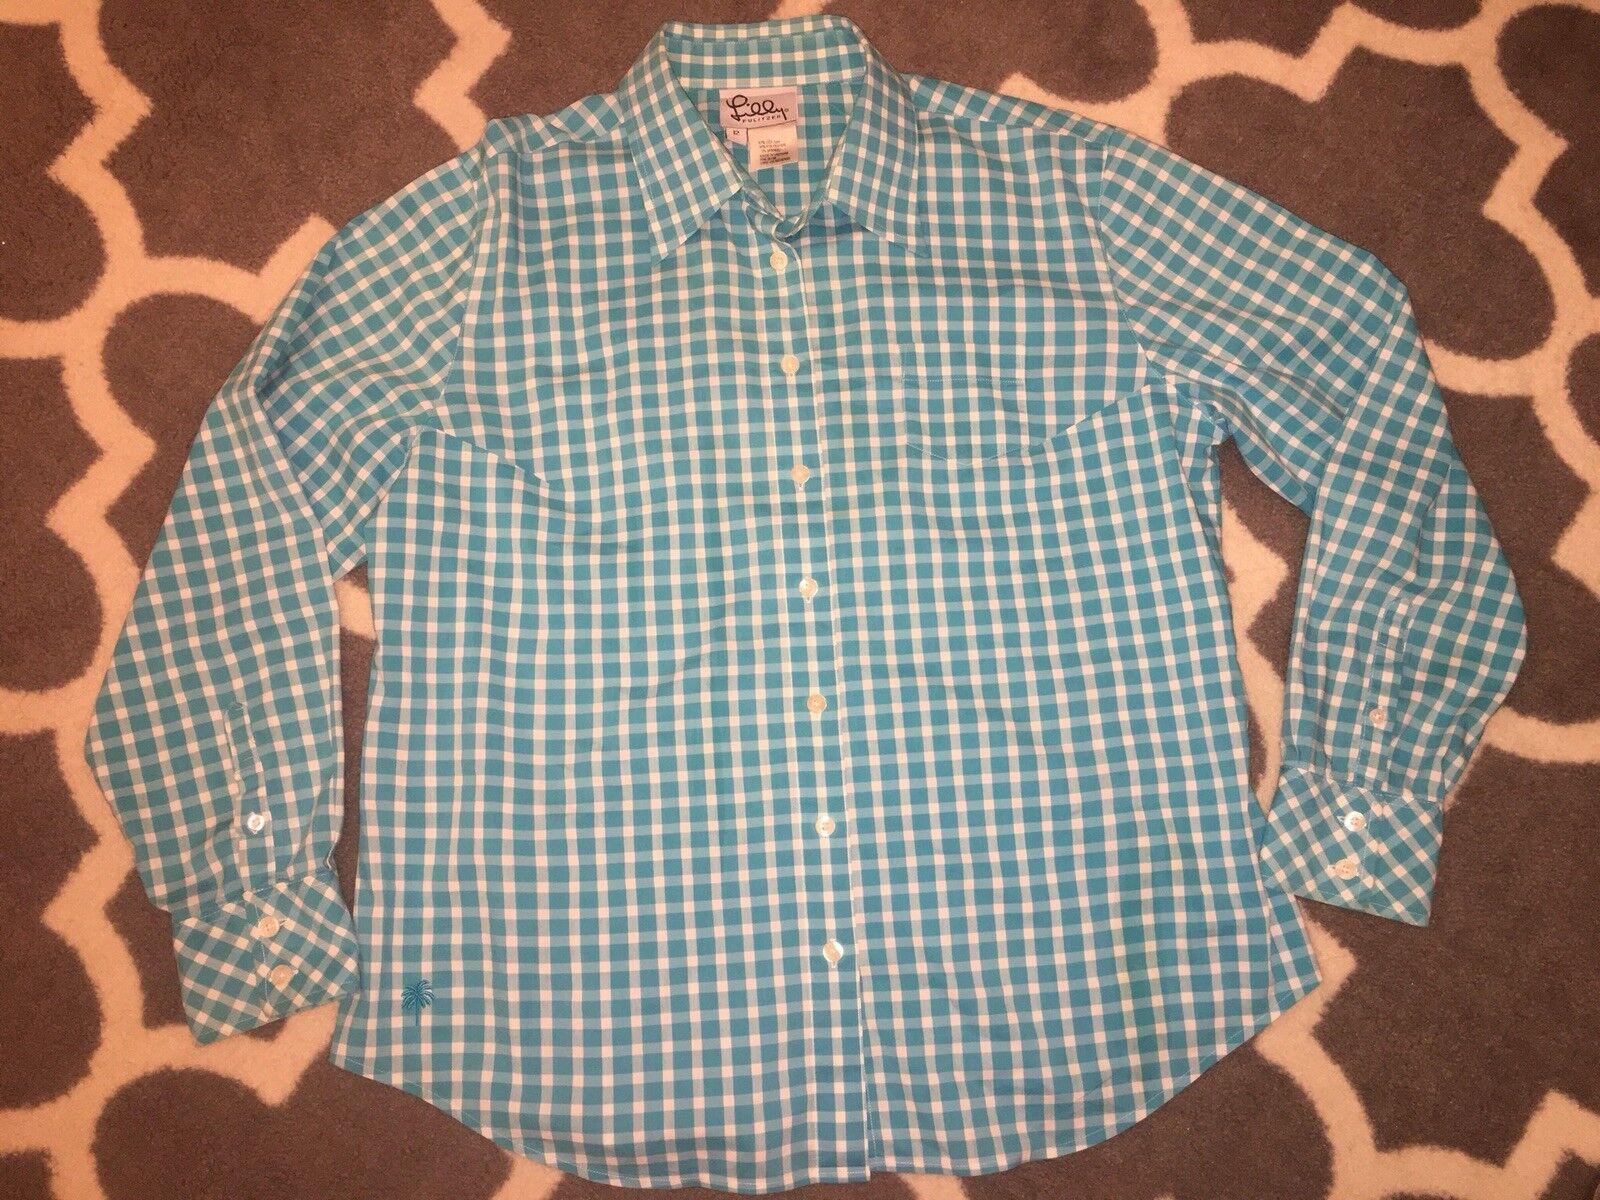 LILLY PULITZER turquoise Weiß Gingham Lange sleeve blouse Sz 12 EUC stretch